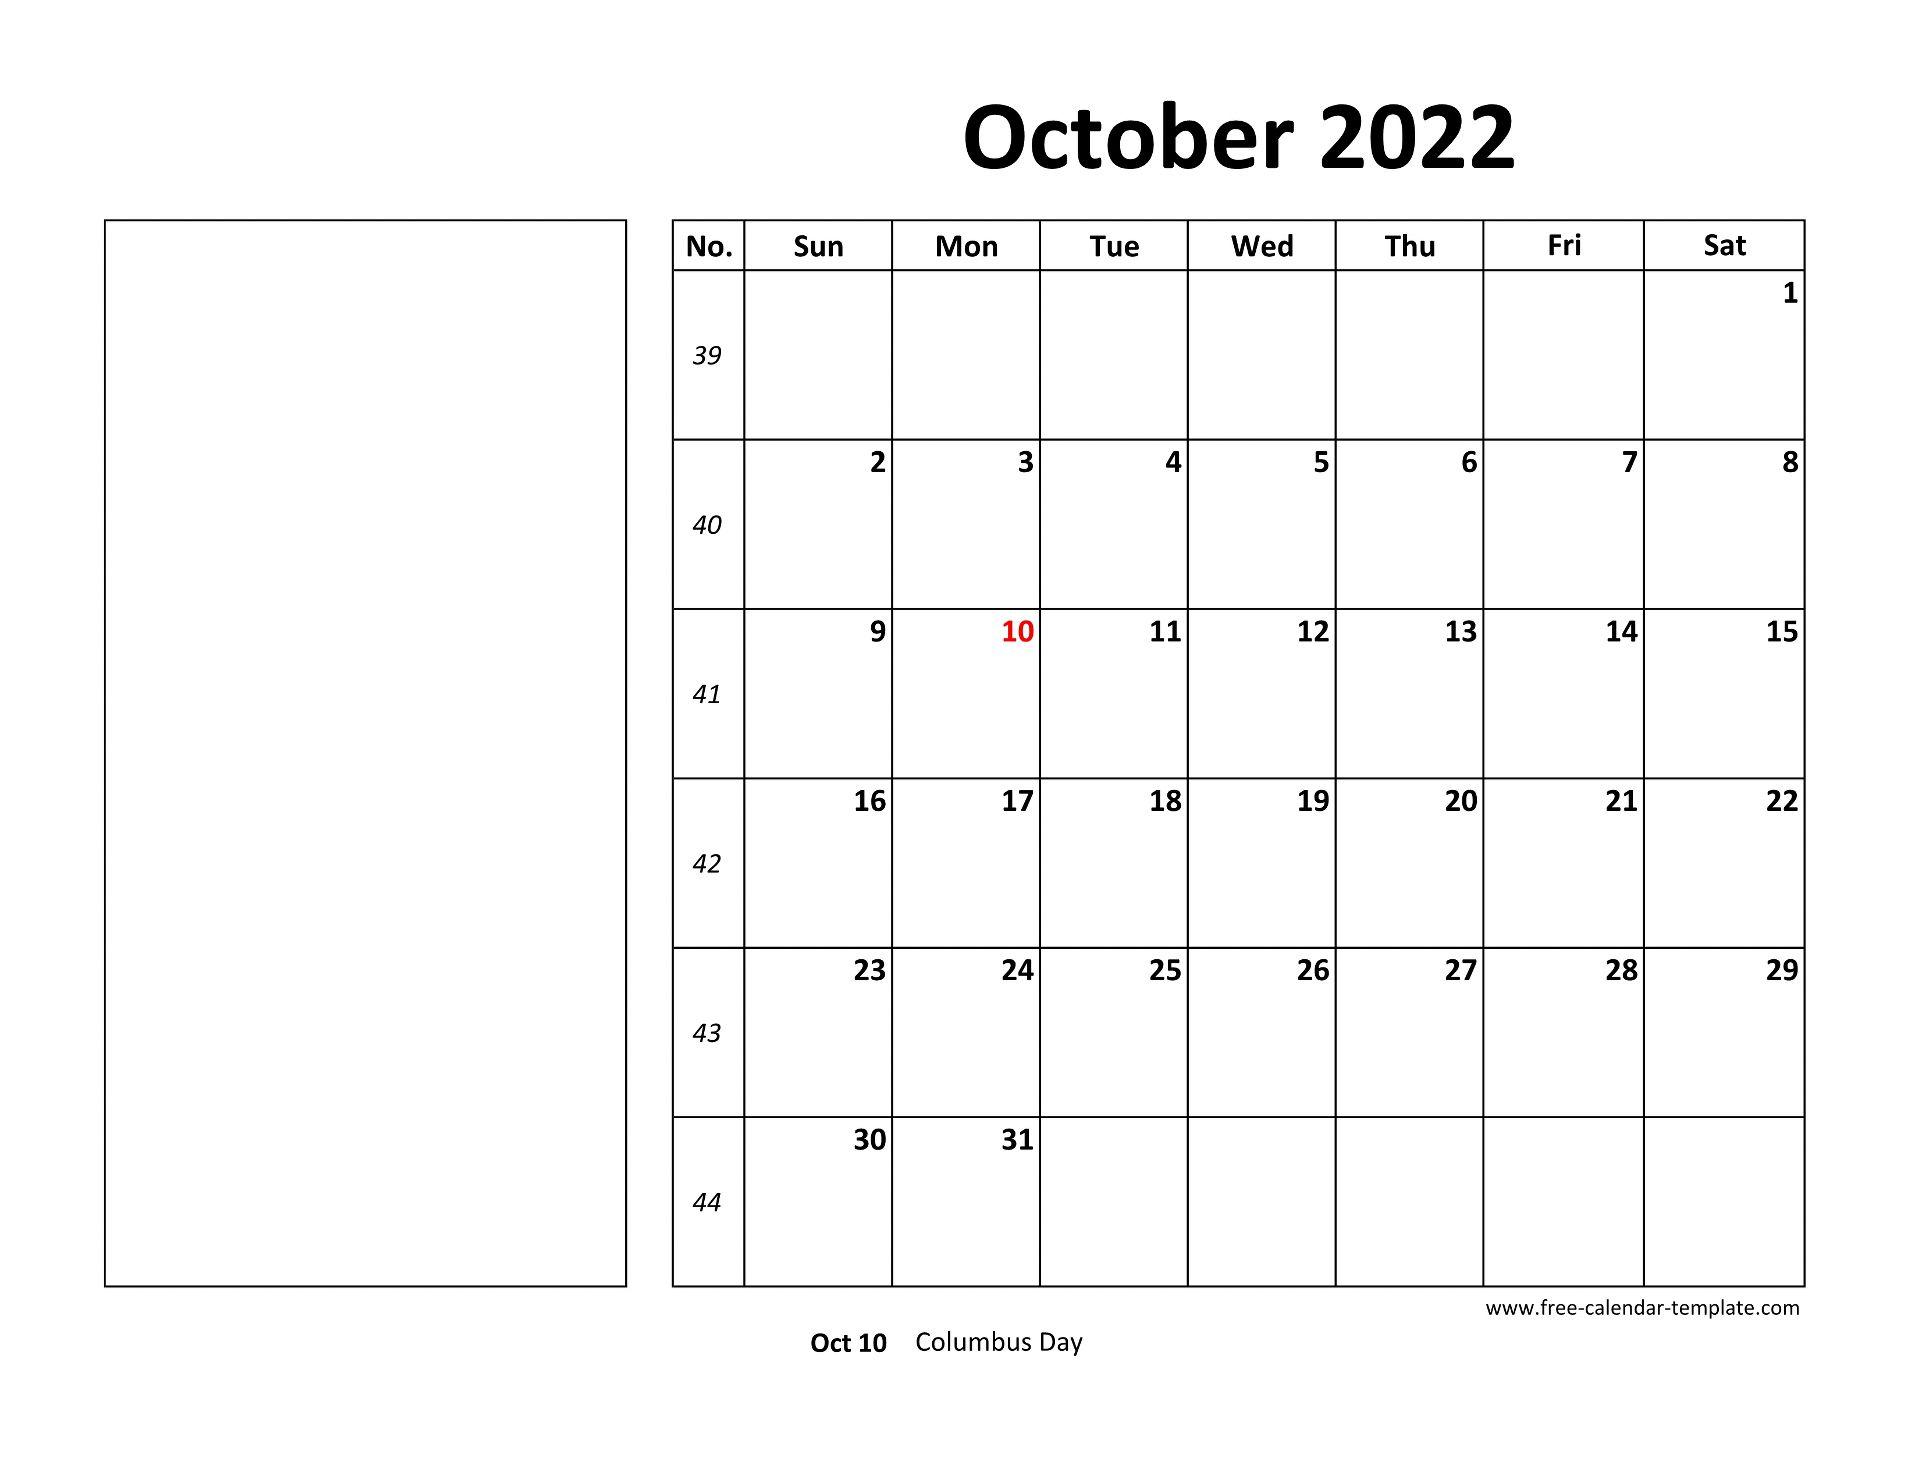 October 2022 Free Calendar Tempplate | Free-calendar ...